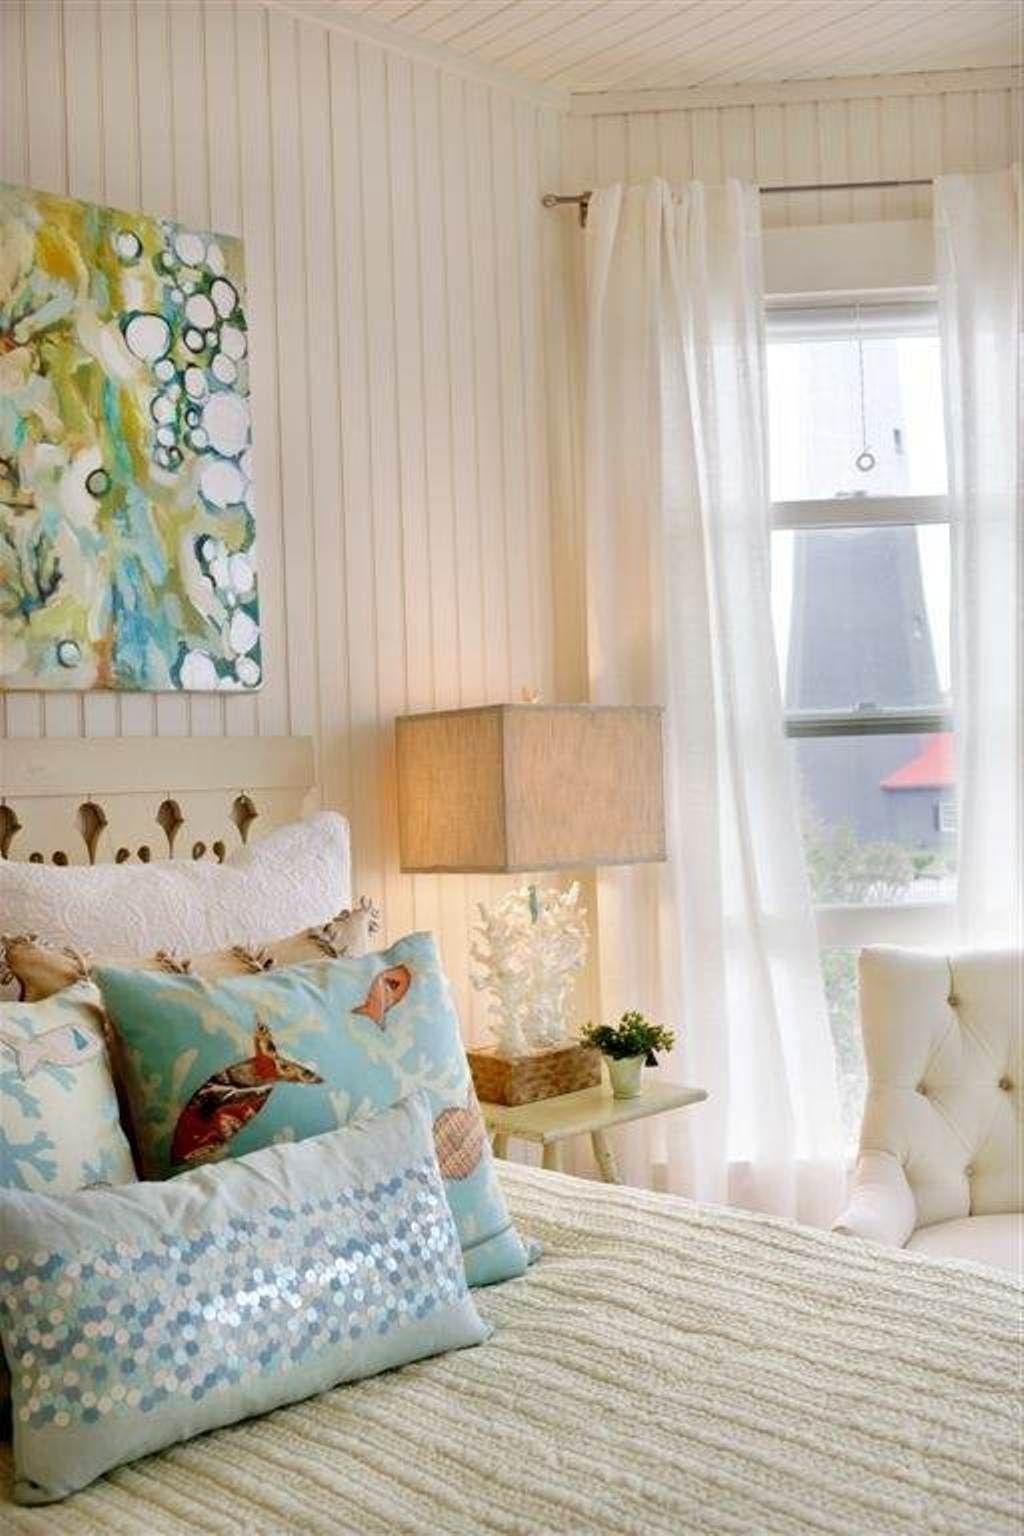 Coastal Bedrooms Ideas – Coastal Decorating Ideas for Bedrooms